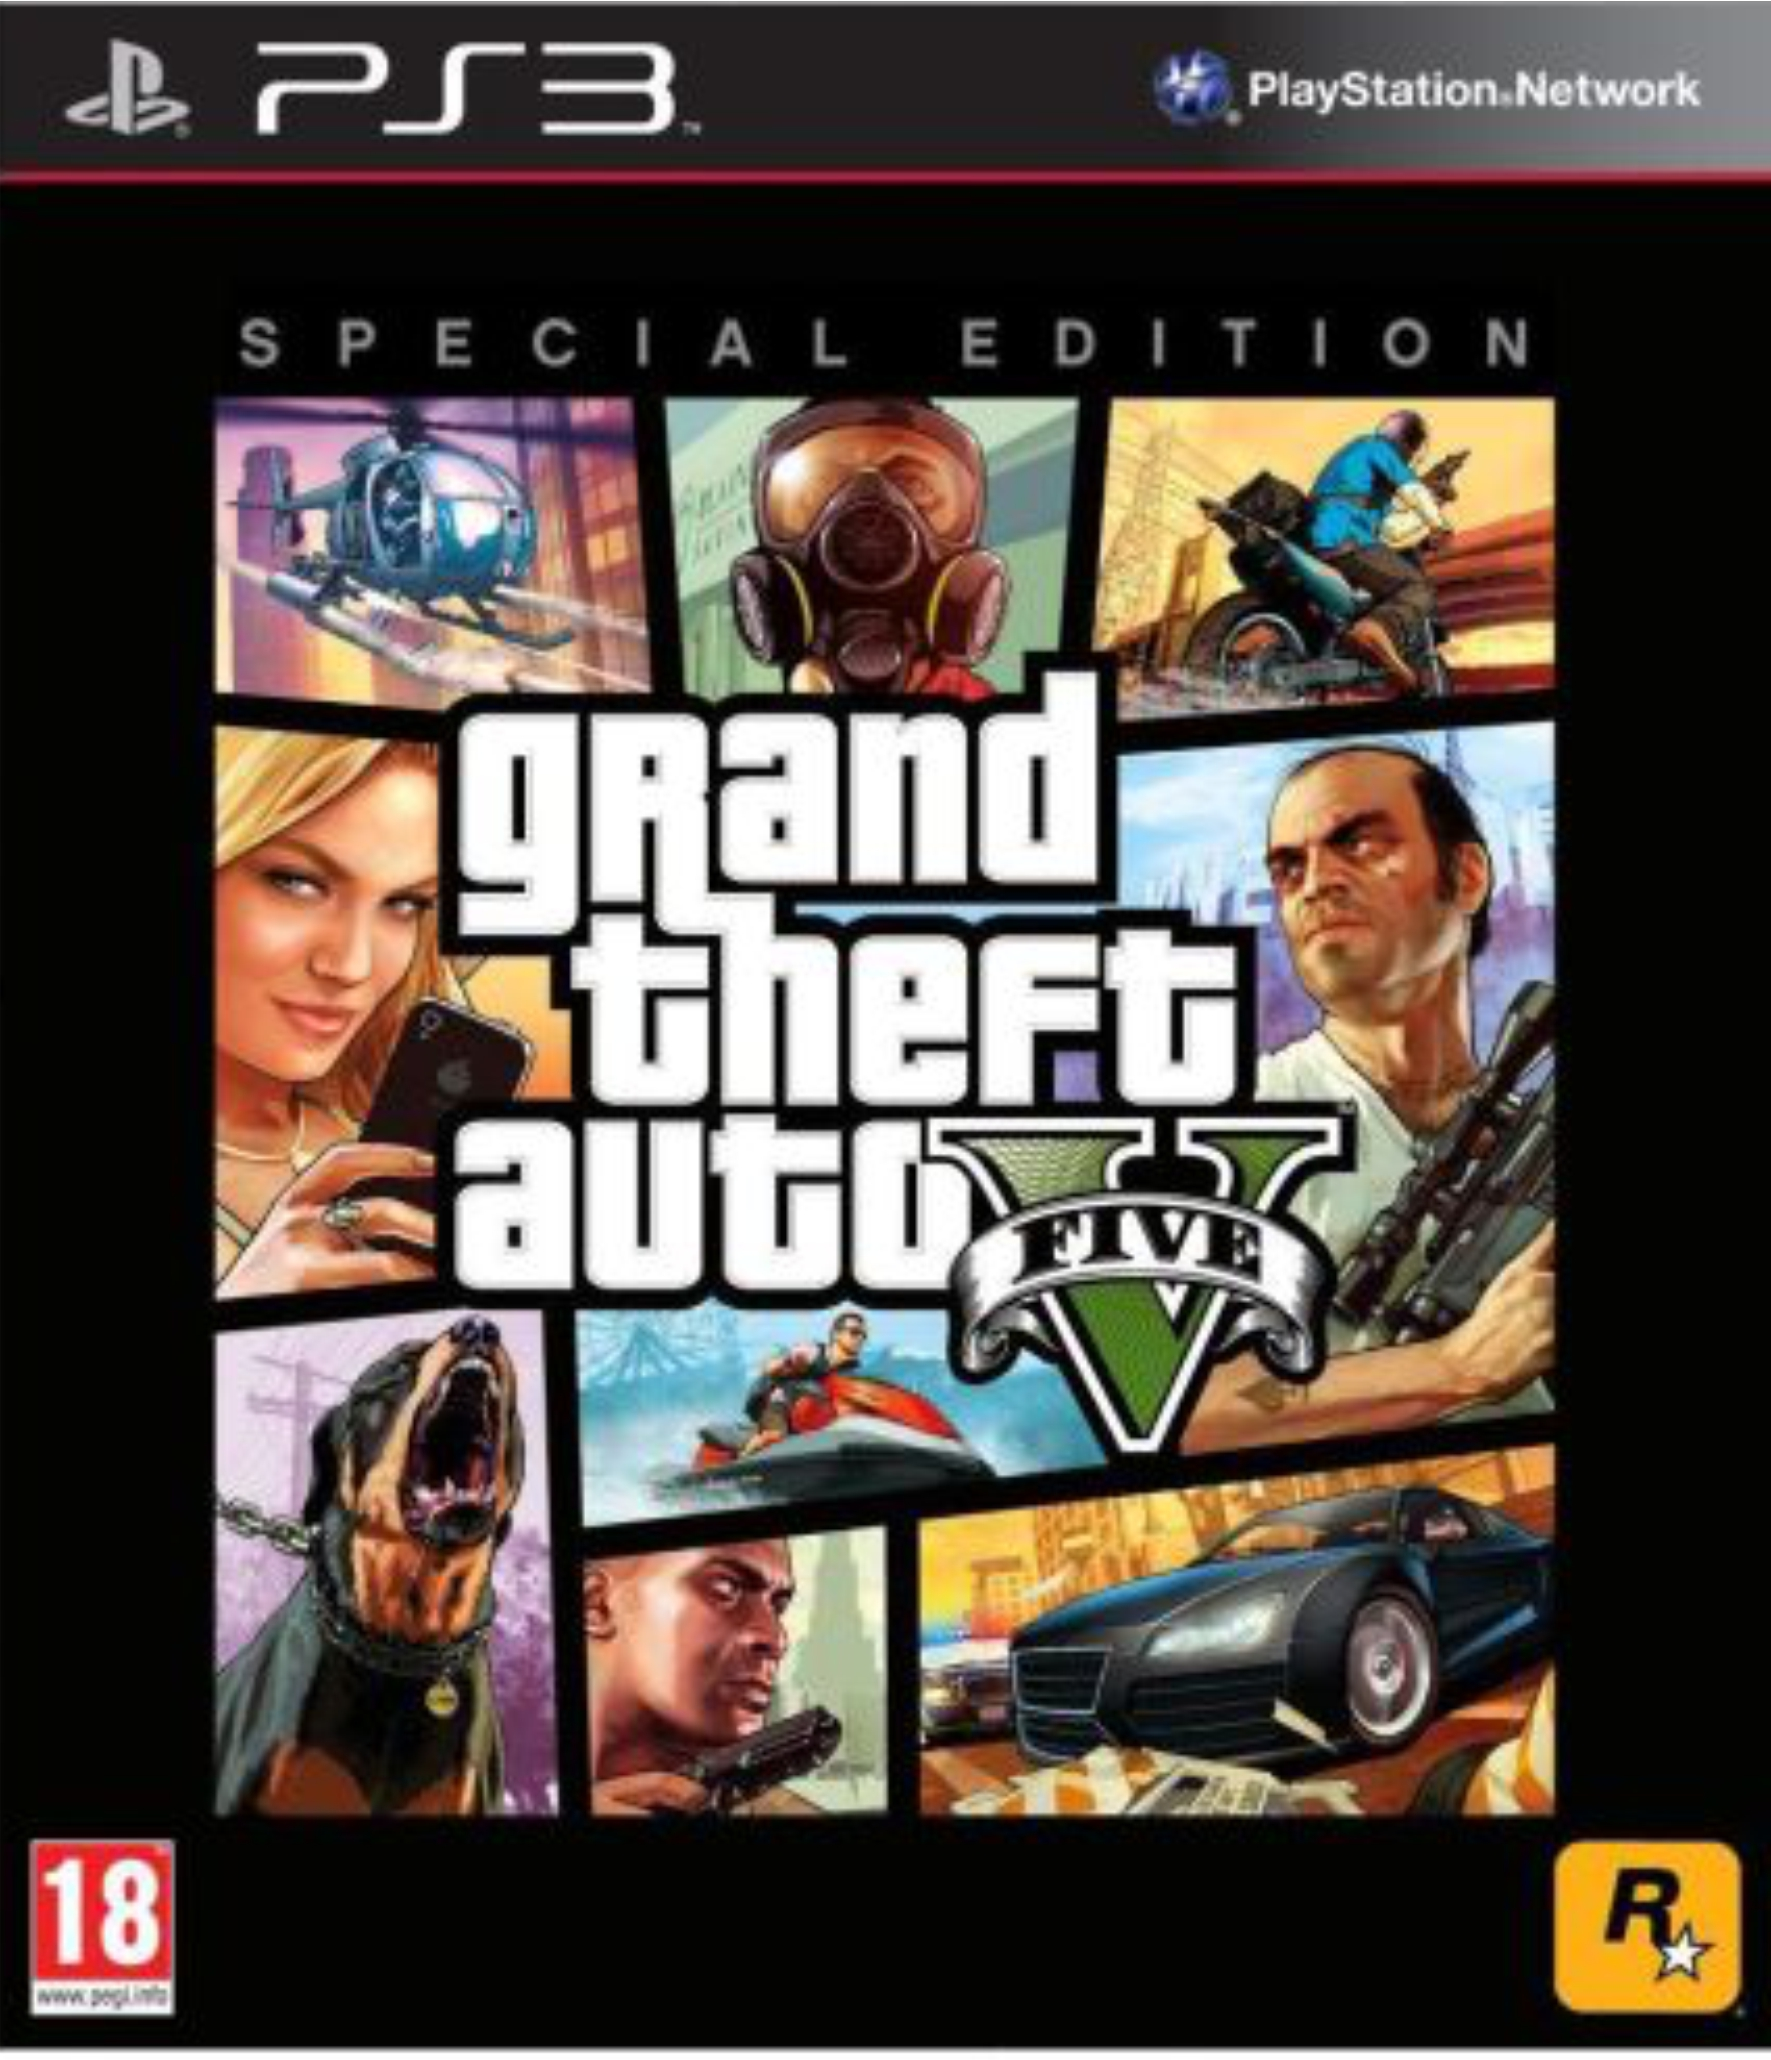 PS3 Grand Theft Auto V (5) Special edition